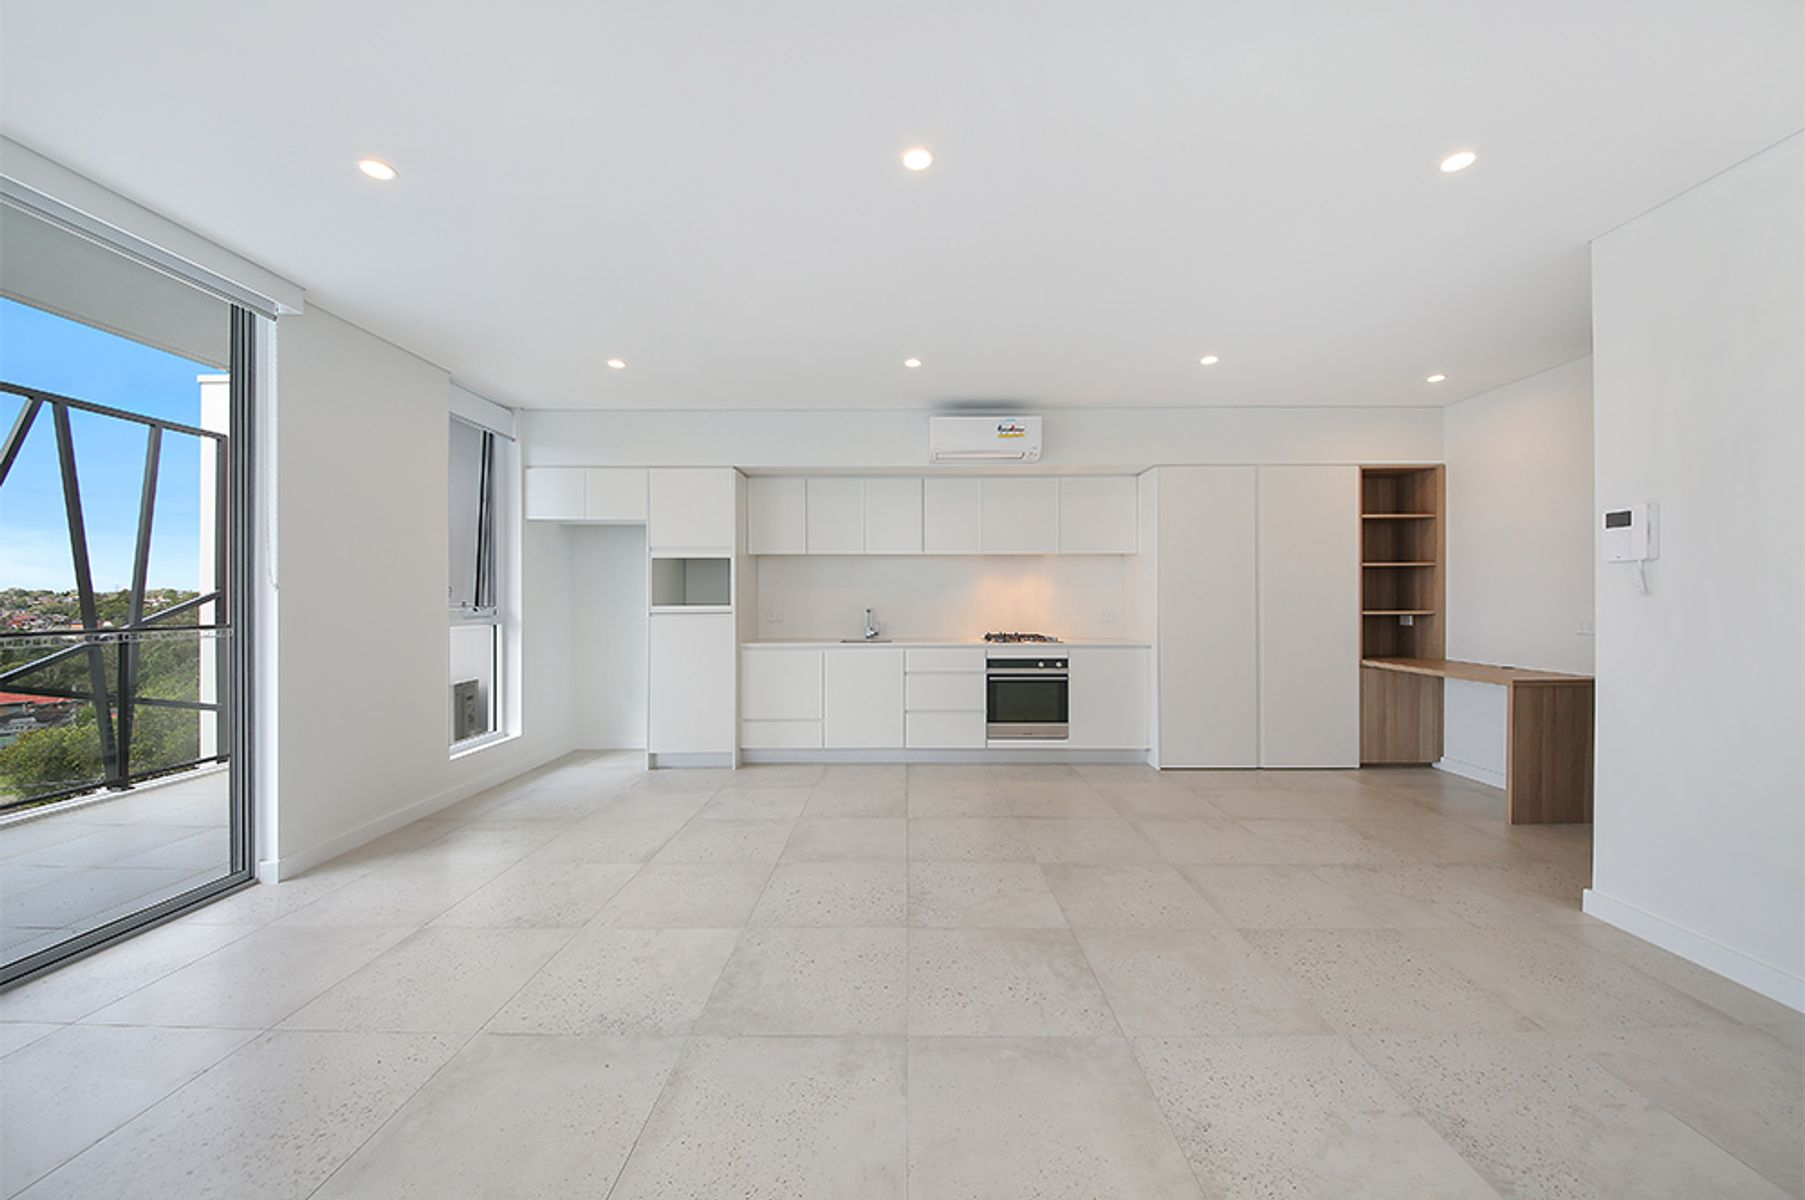 14/134 Centaur Street, Revesby Heights, NSW 2212